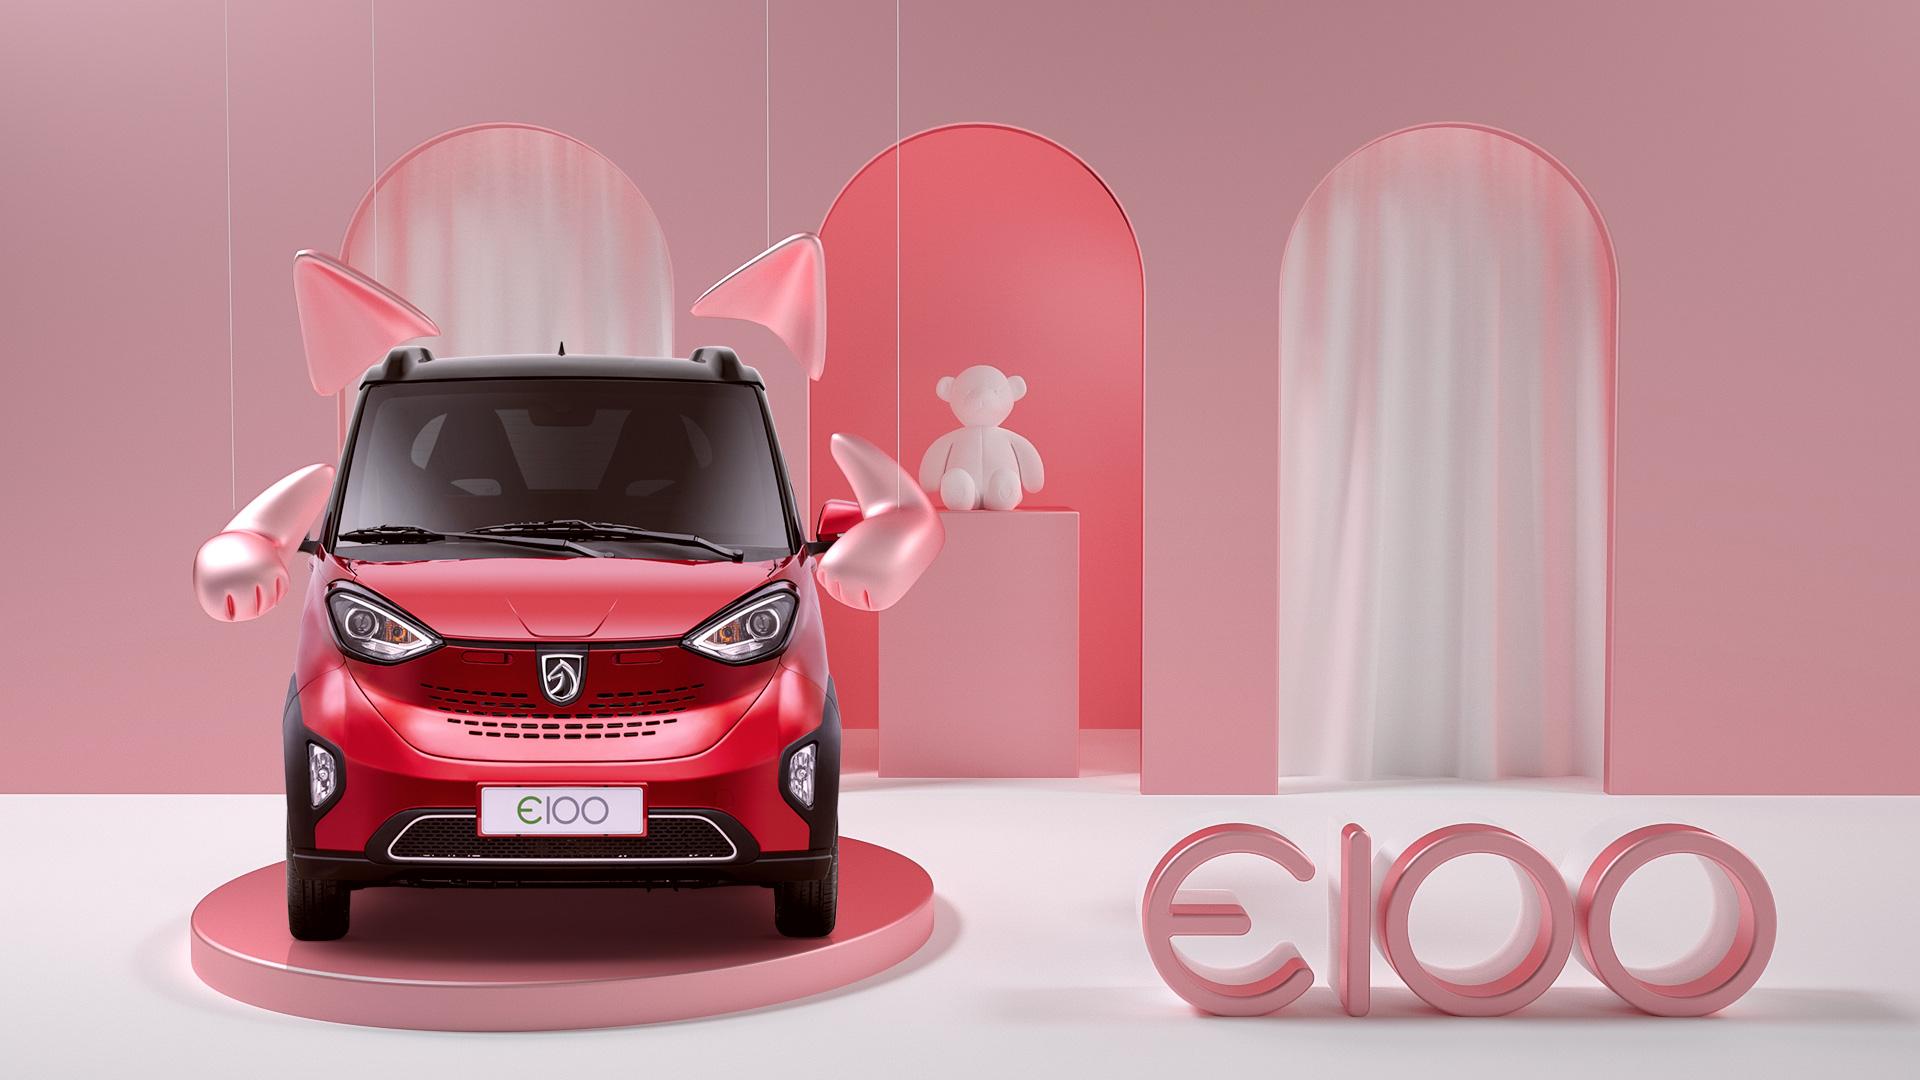 寶(bao)駿E100,電動(dong)汽(qi)車,新能源(yuan)車,外觀,造型(xing),圖片